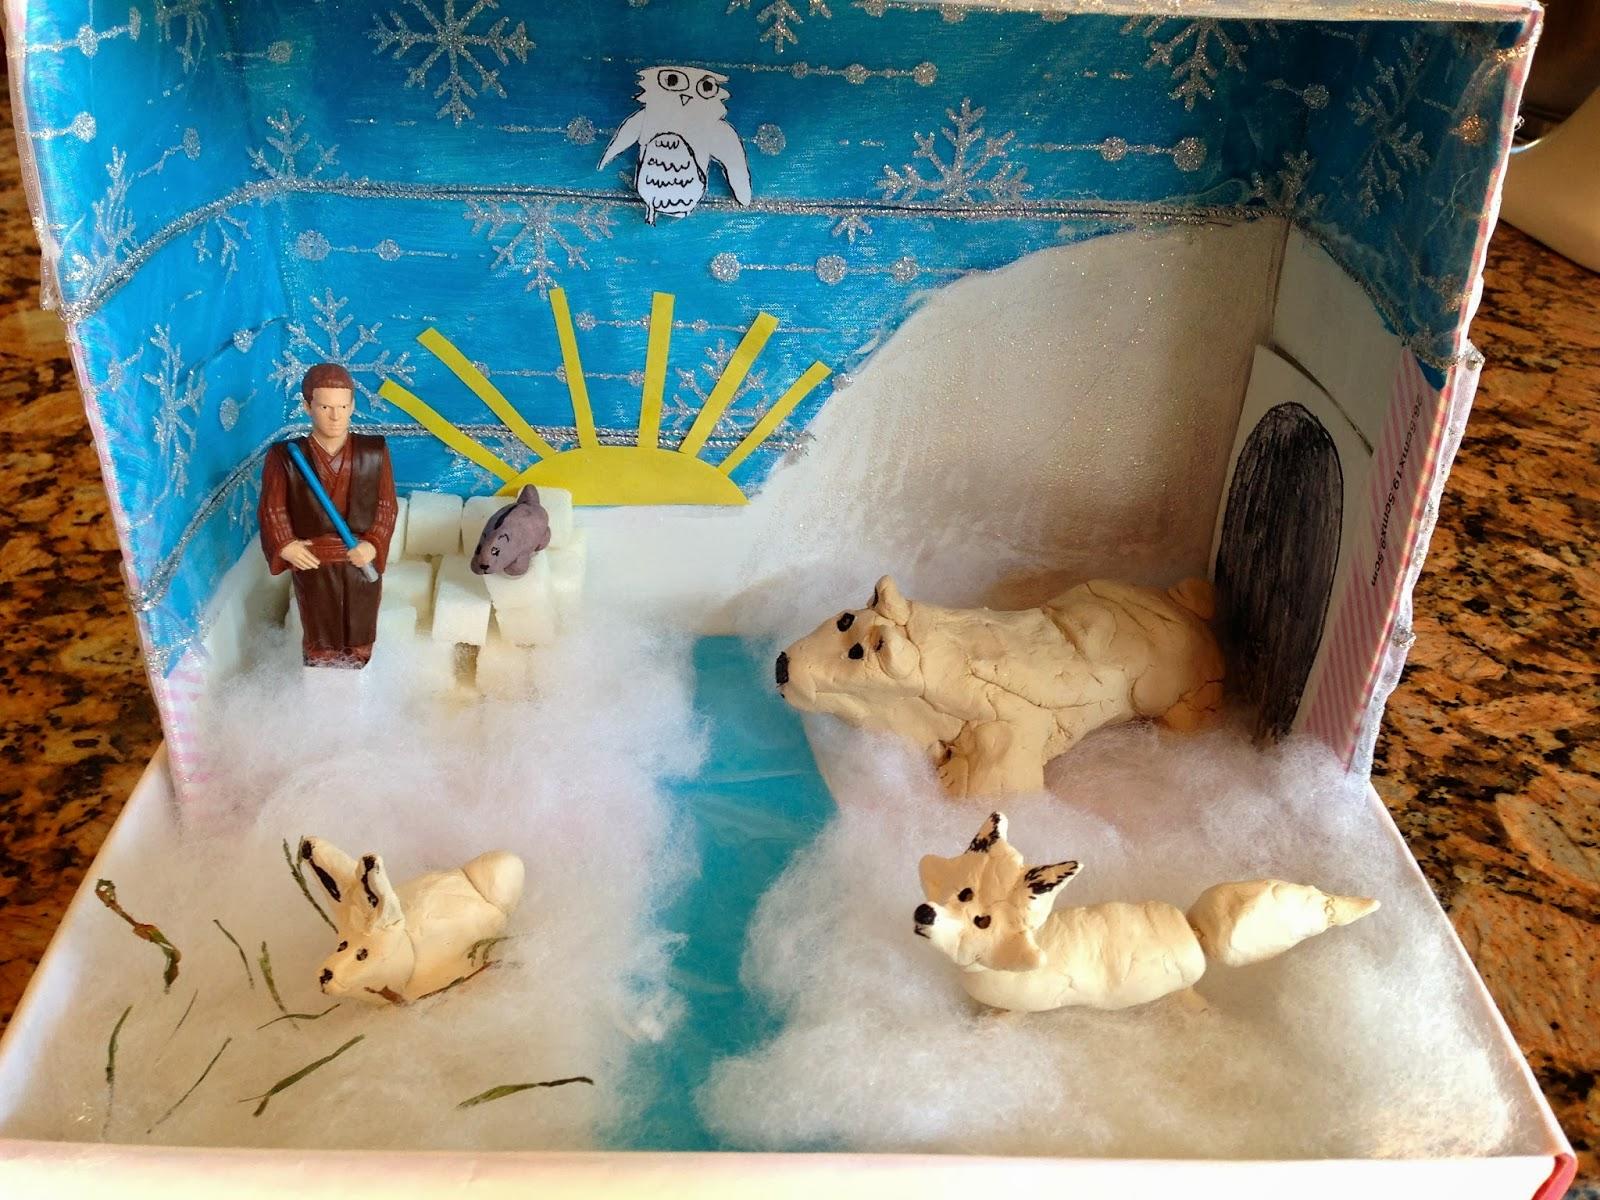 Arctic wolf diorama - photo#11